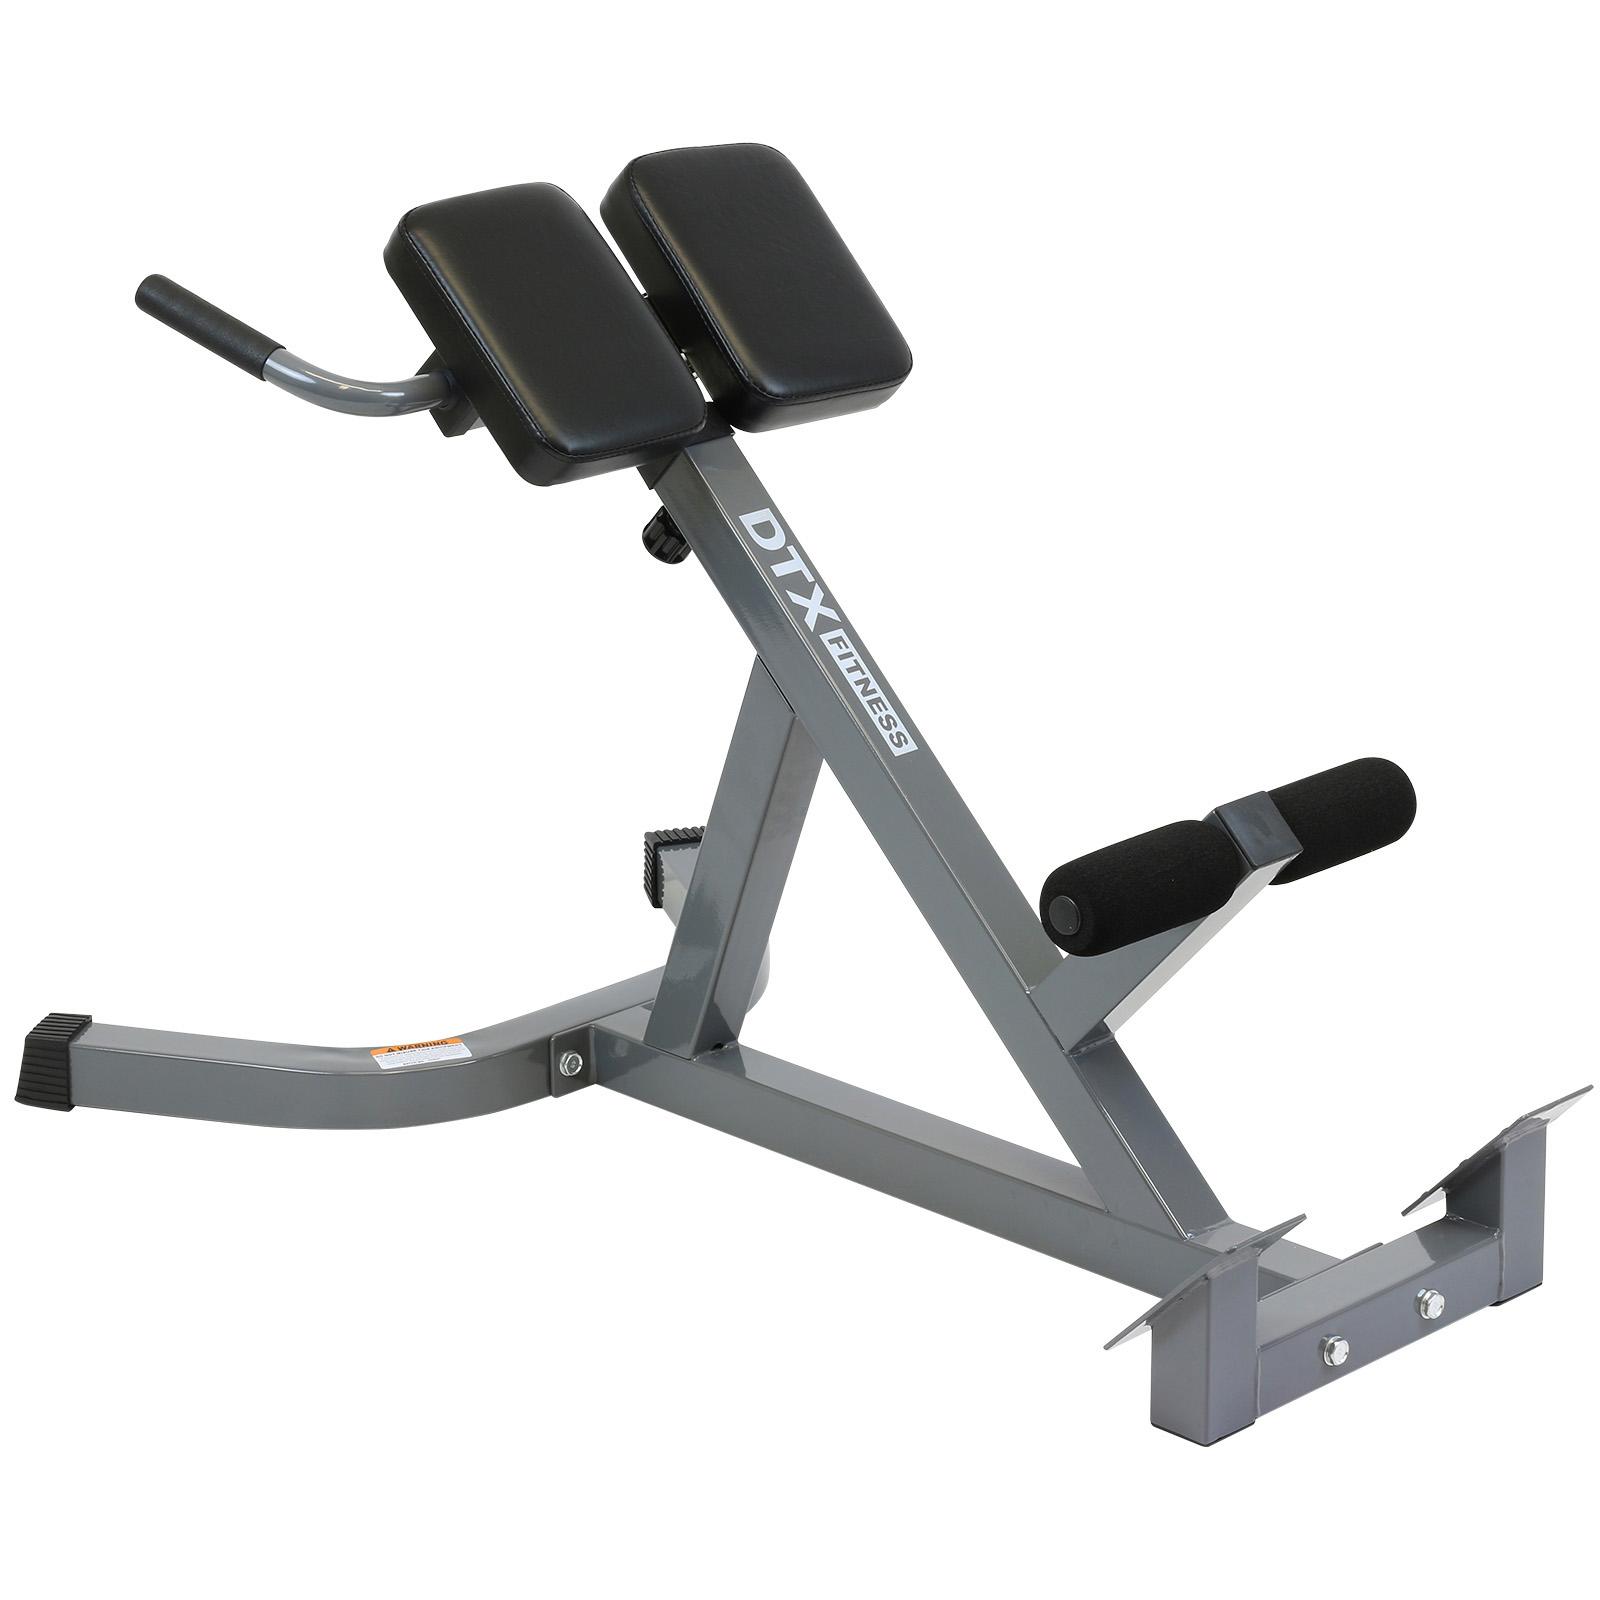 Dtx Fitness Back Hyper Extension Exercise Bench Hyperextension Roman Chair Lower Ebay